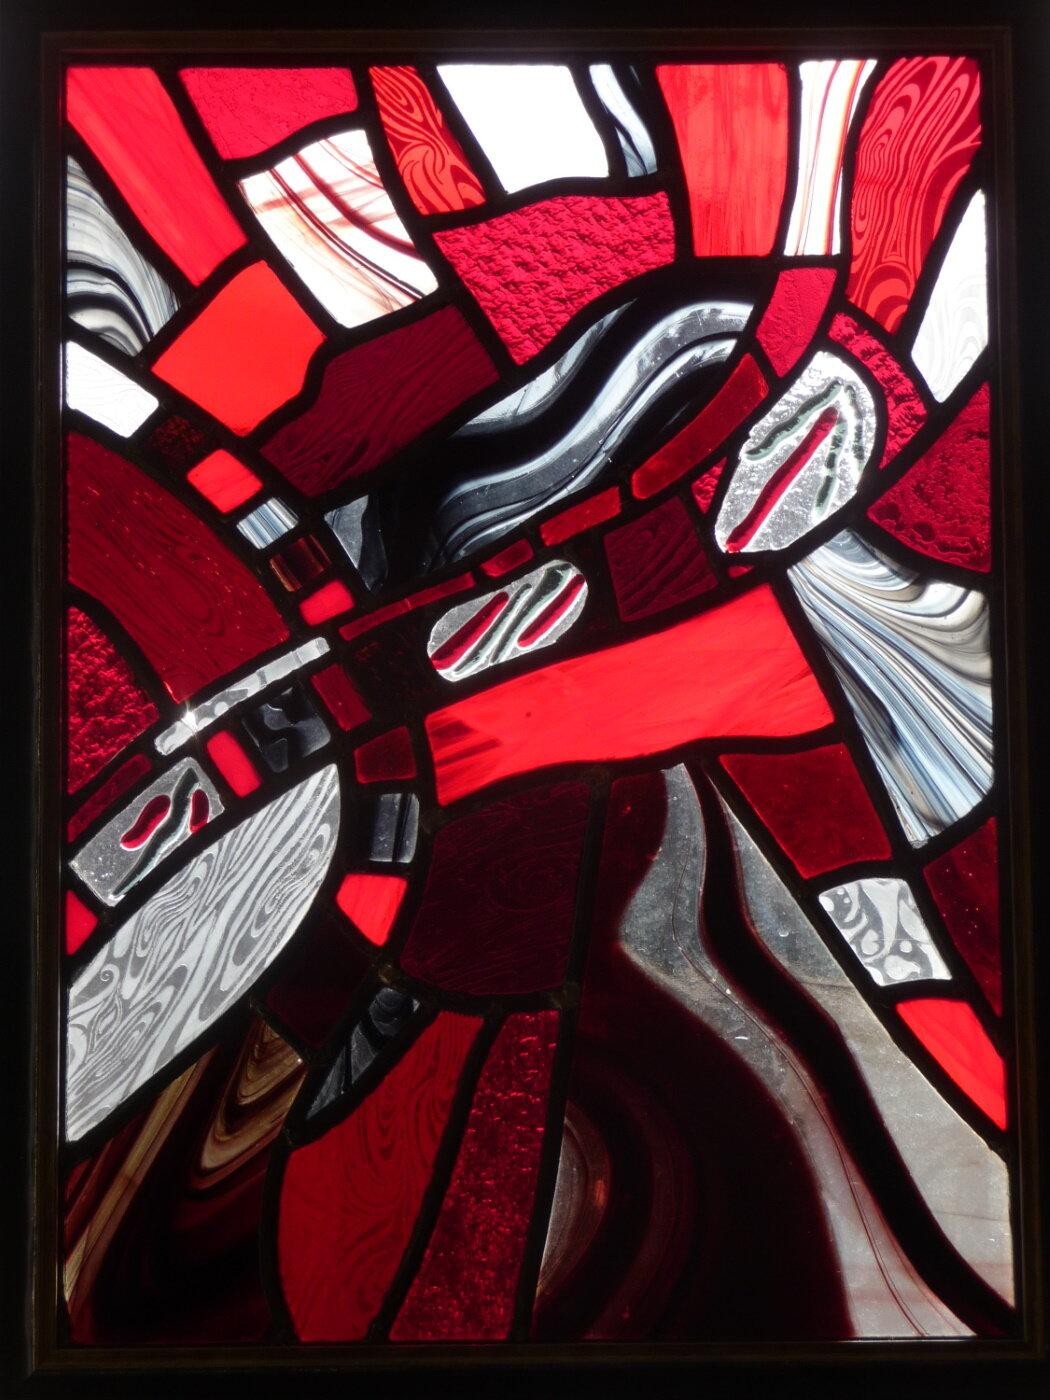 eva-glass-design-red-black-swirls-stained-glass-window-panel.jpg